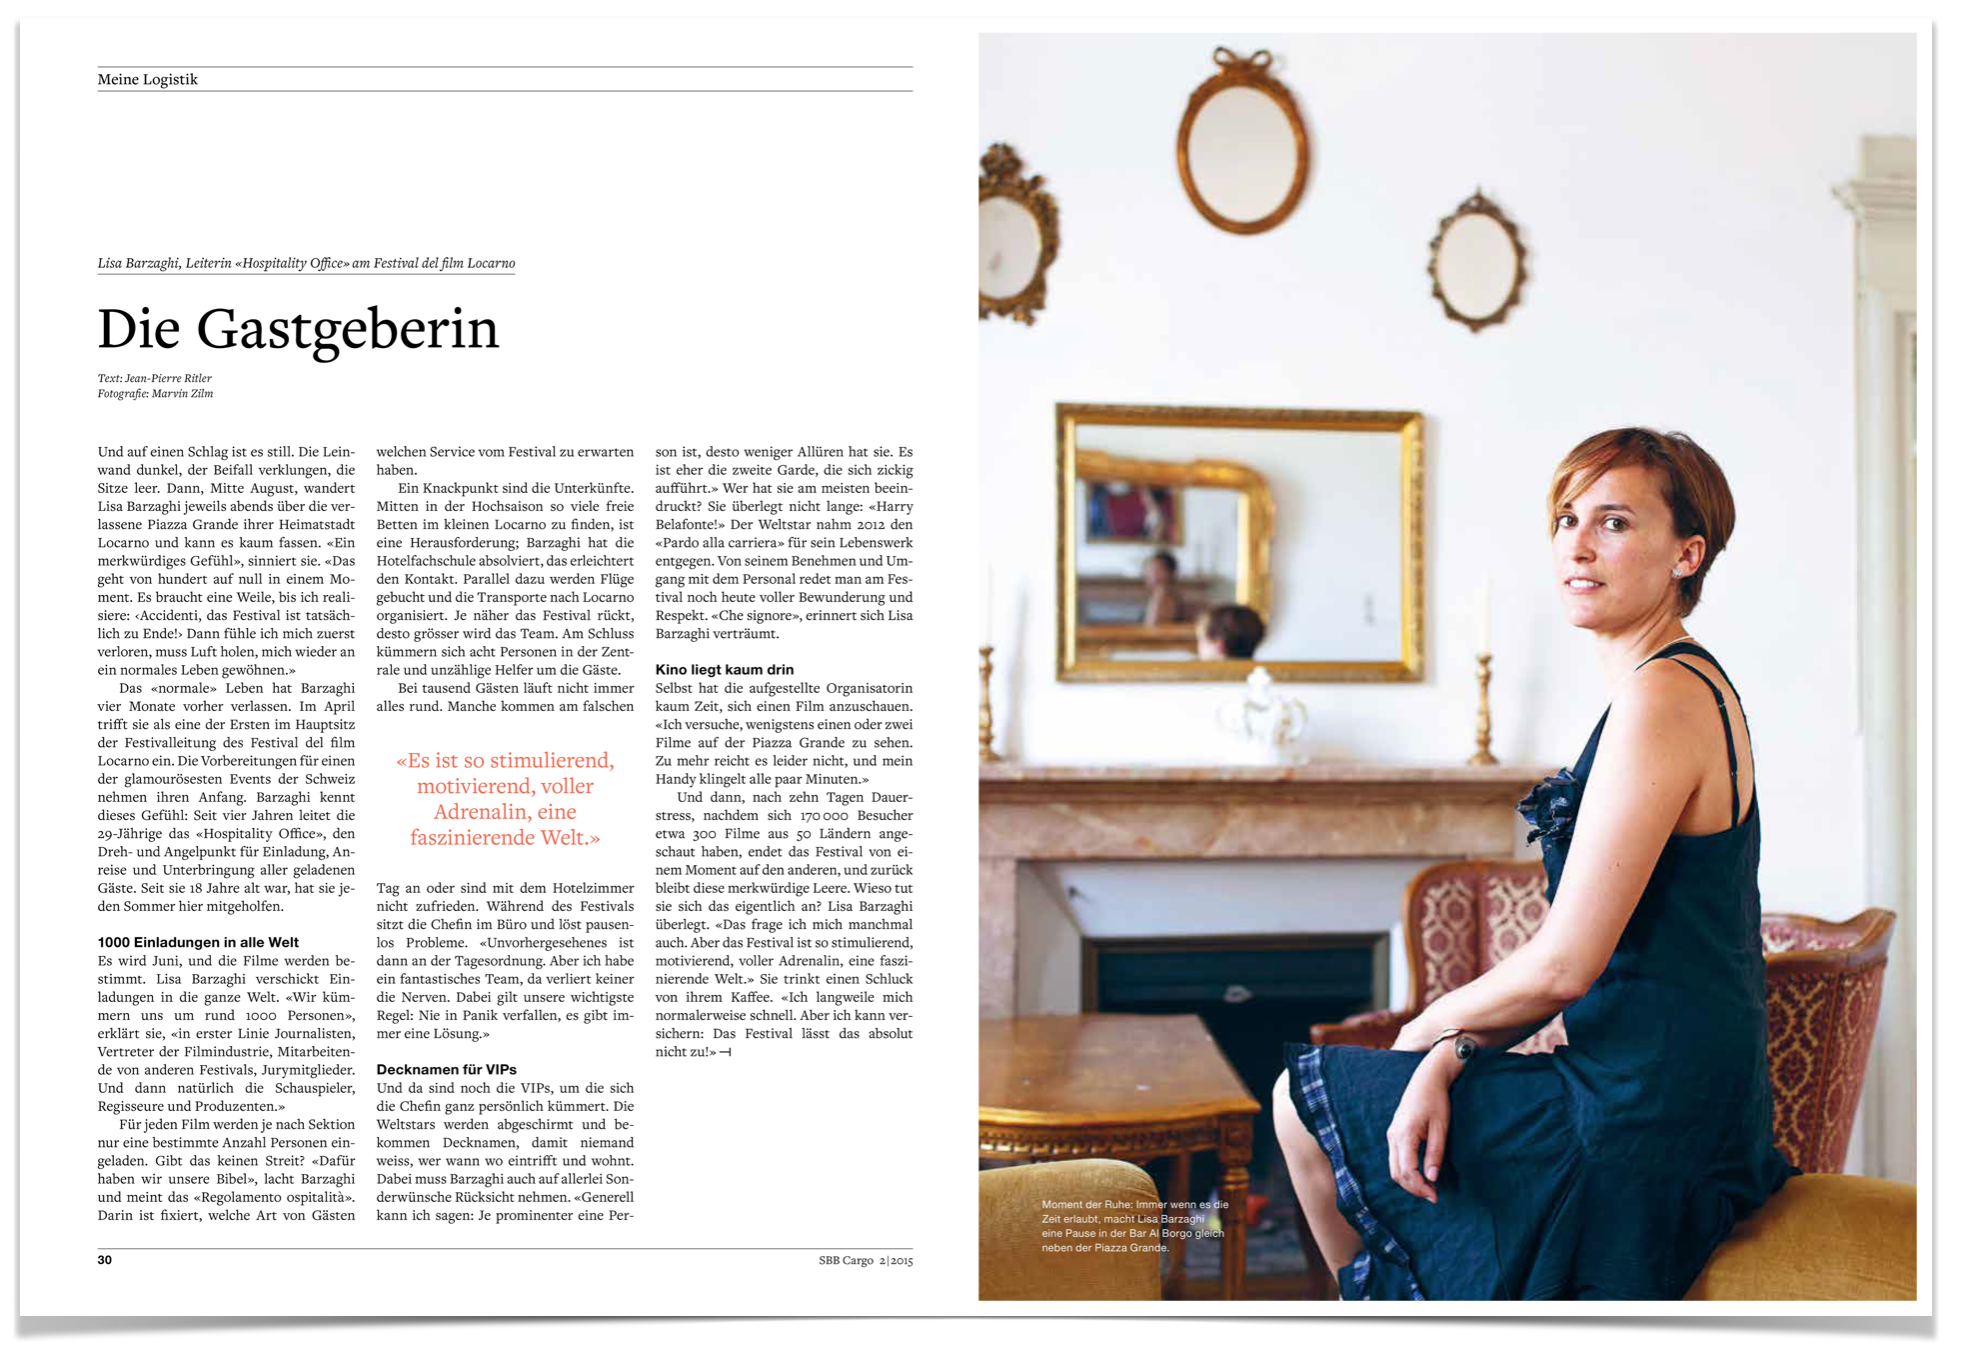 Die Gastgeberin_Text by JPR Media